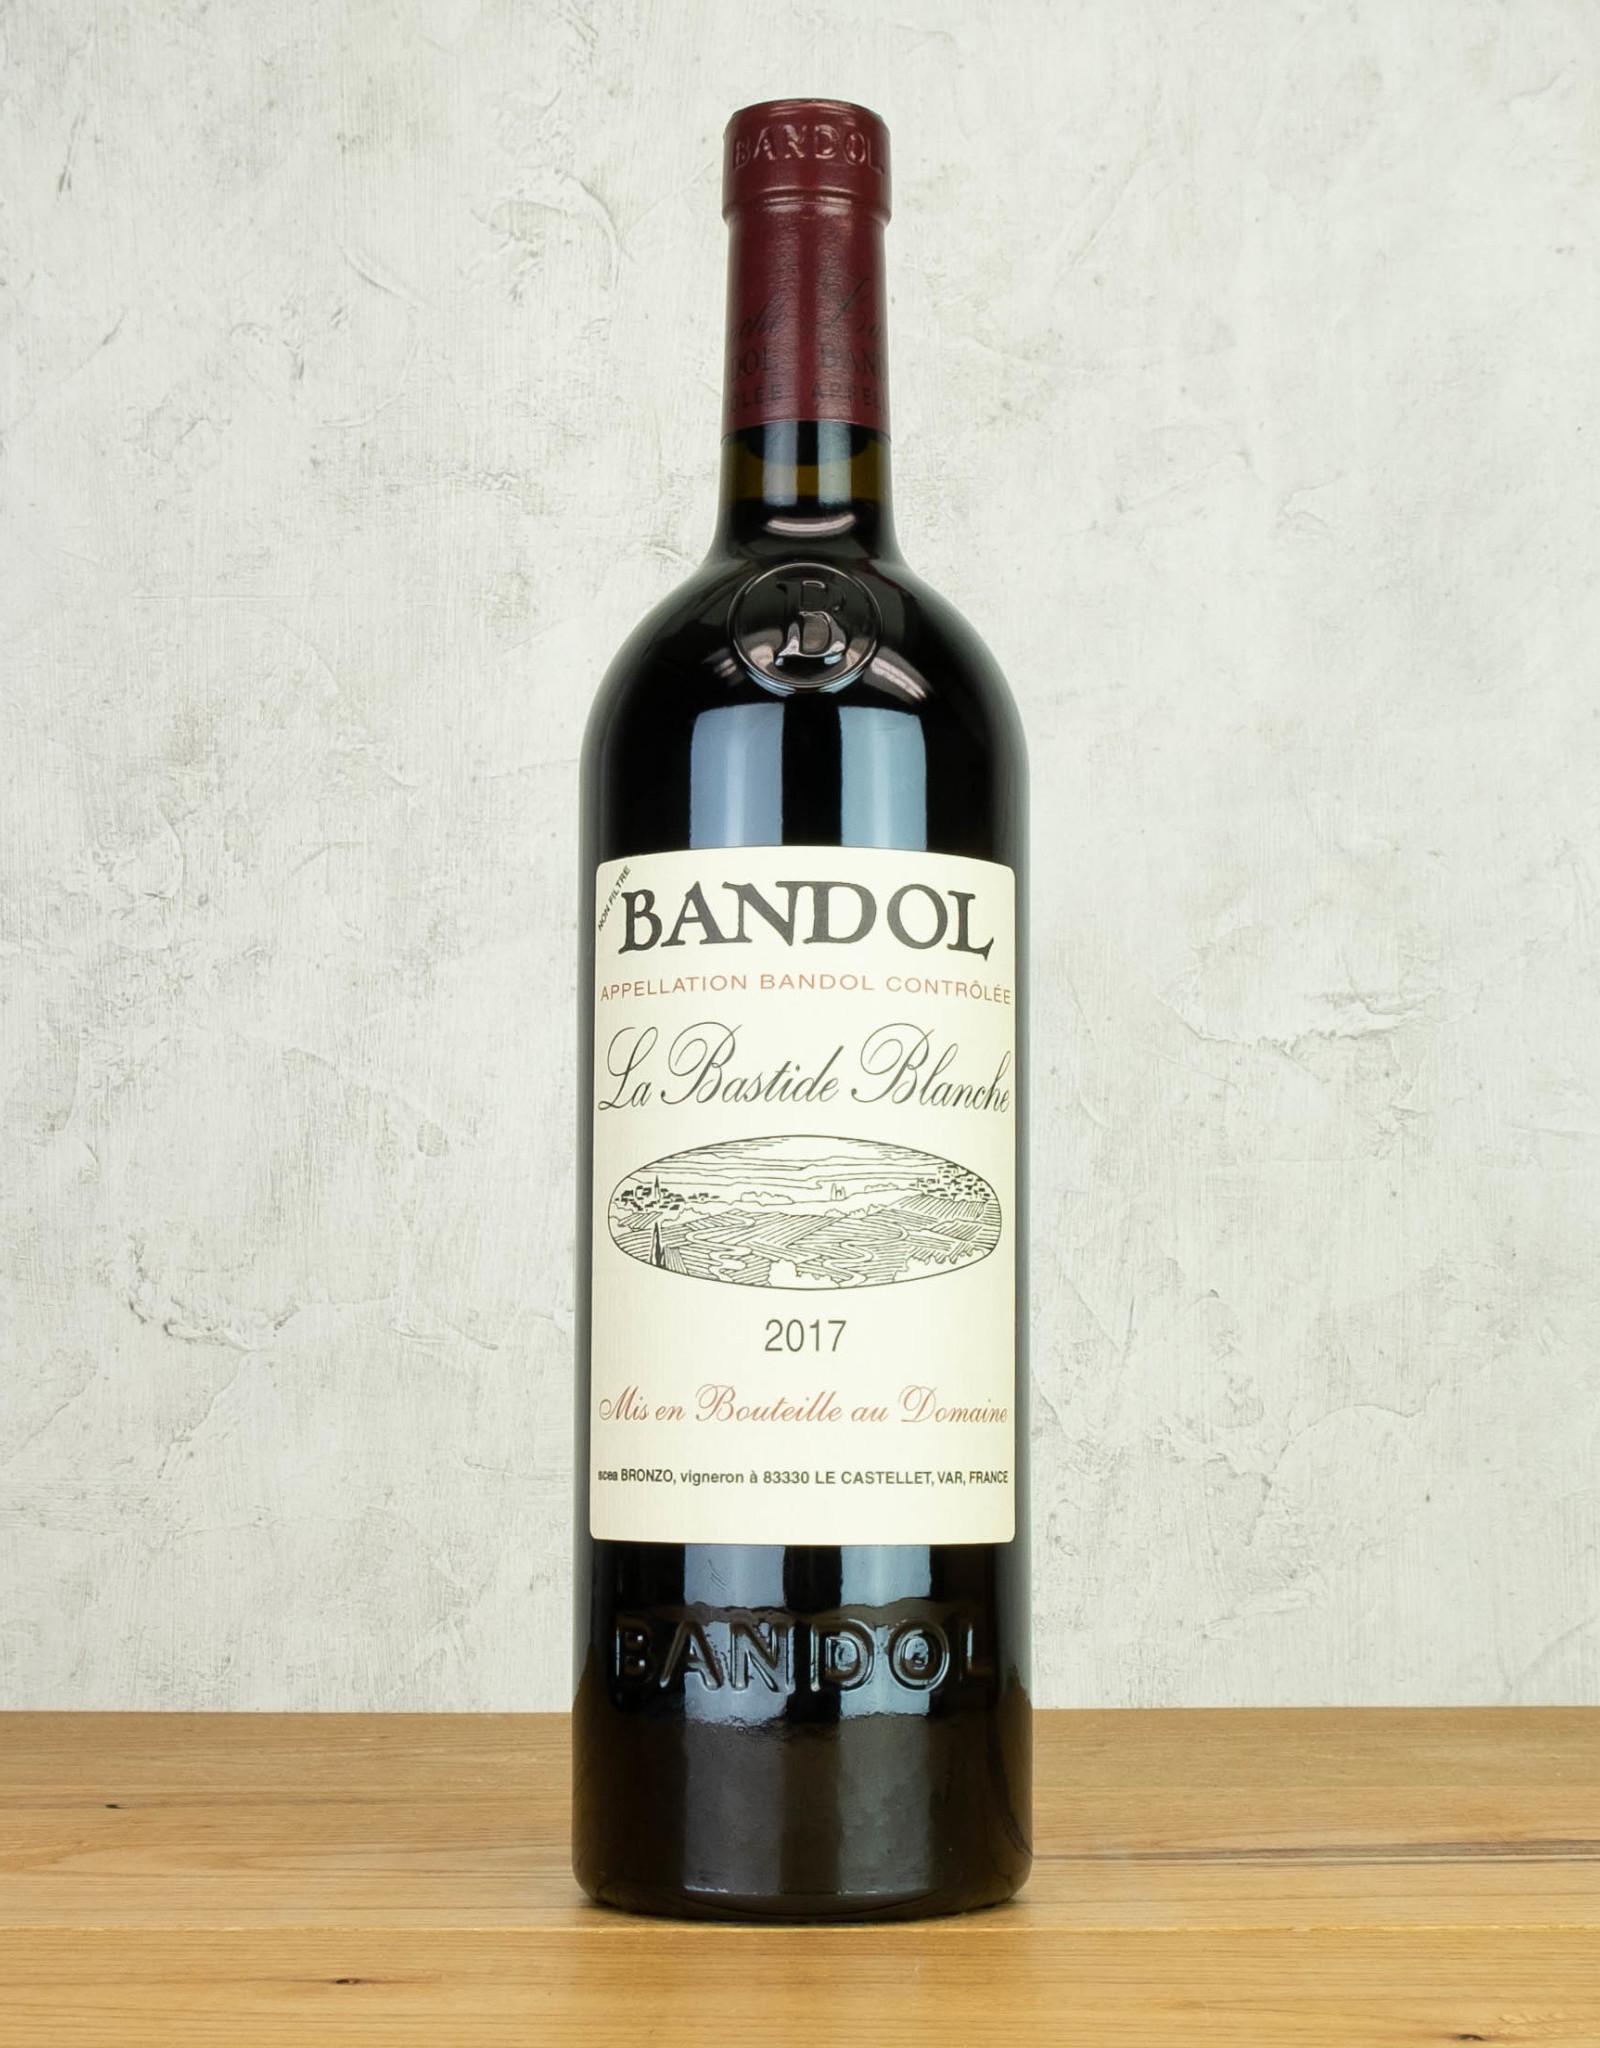 La Bastide Blanche Bandol Rouge